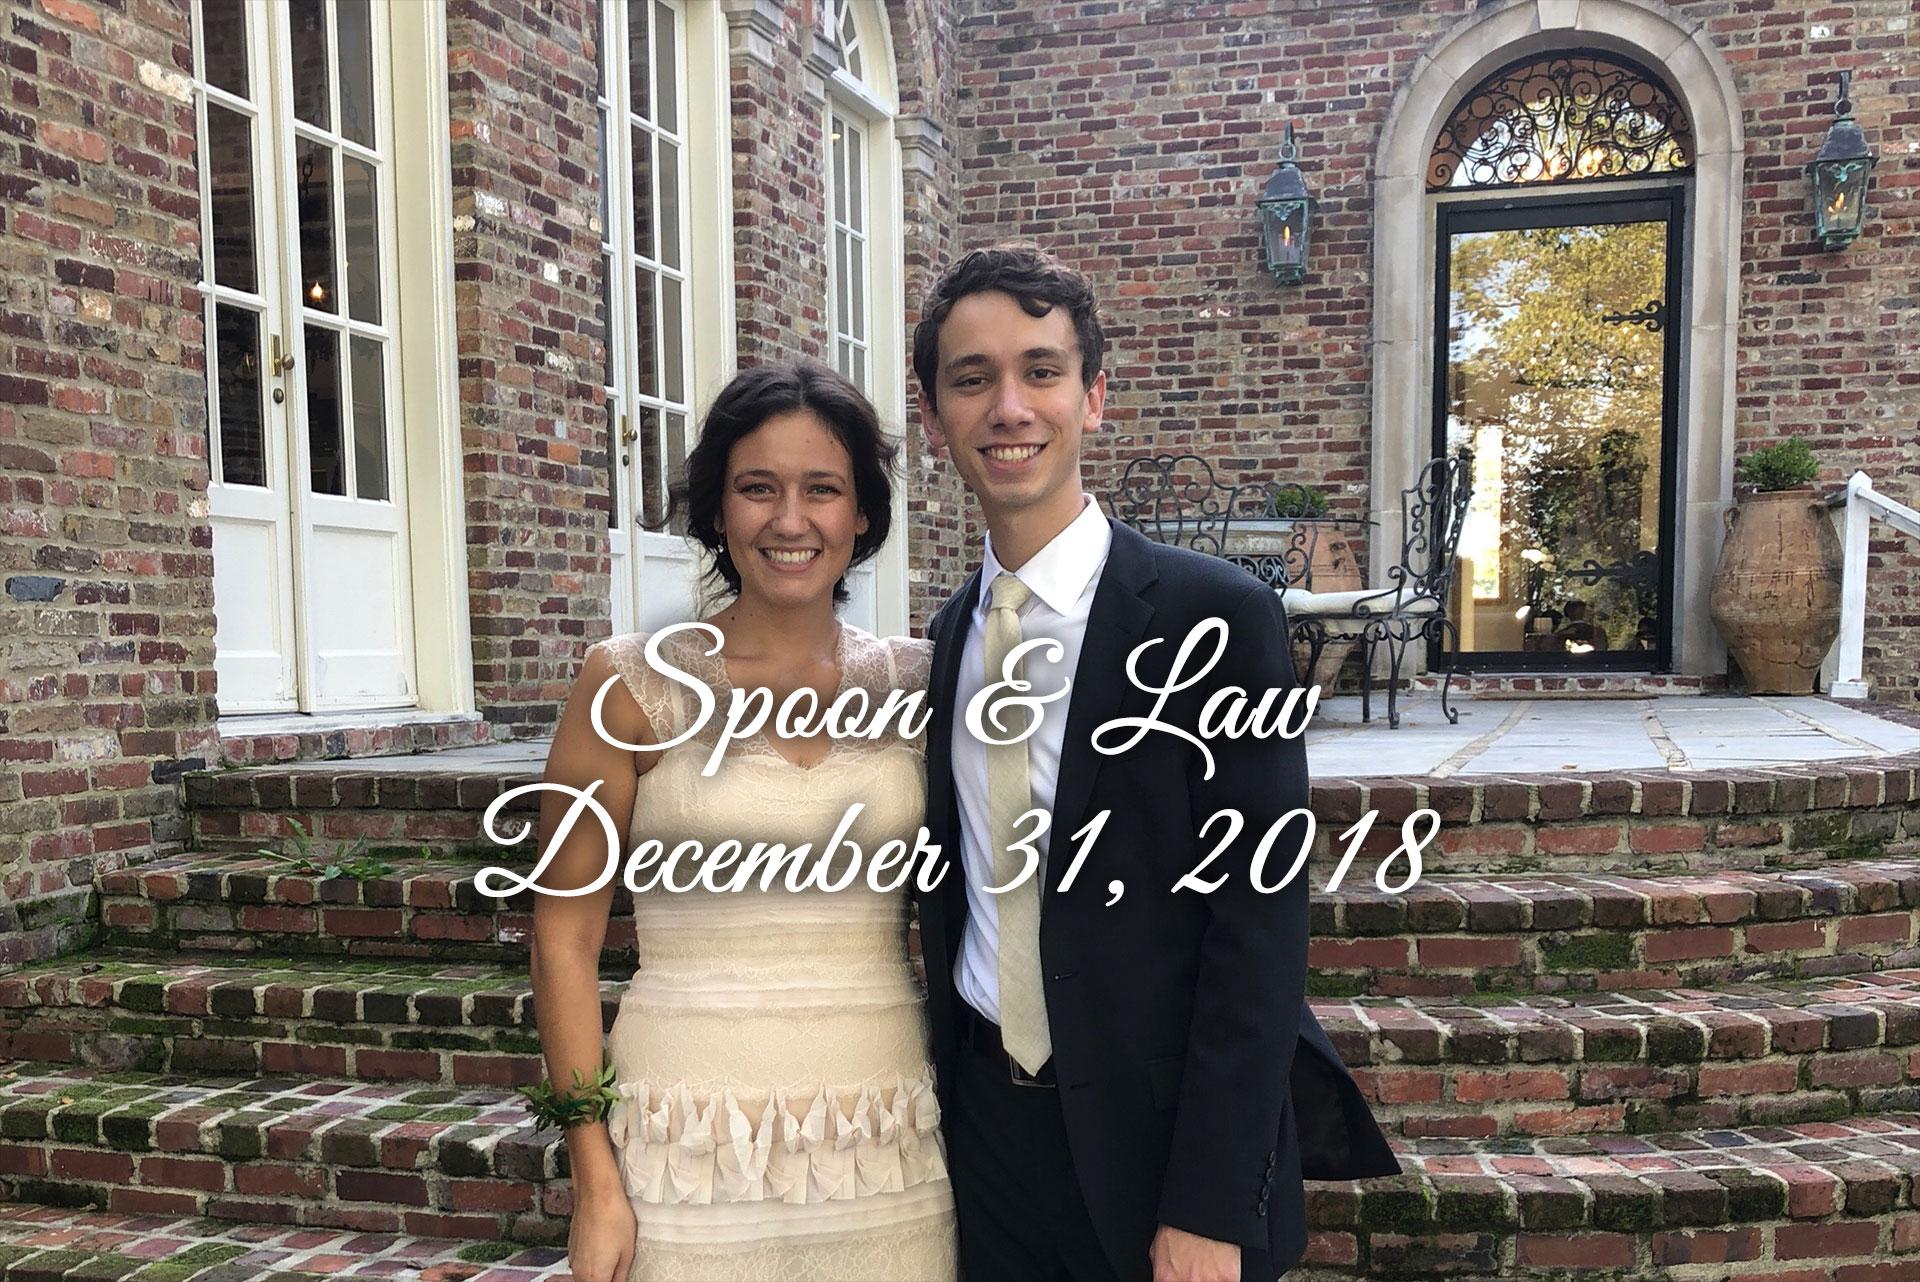 Spoon-Law Remnant Fellowship Wedding